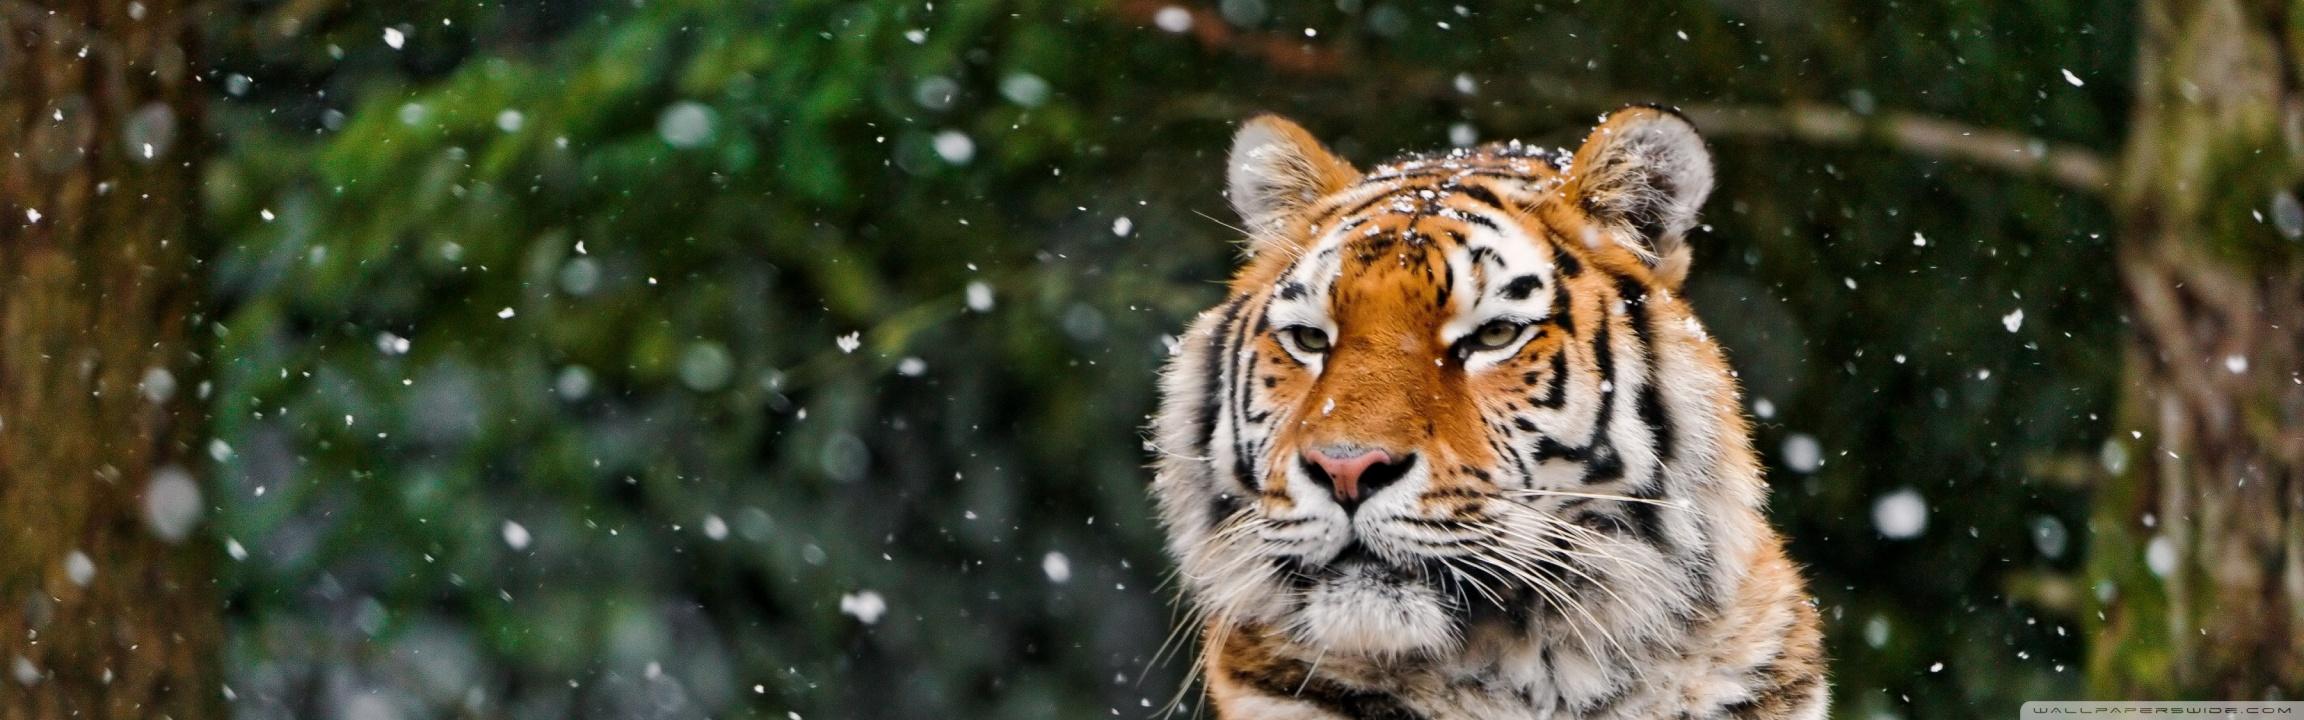 Jaguar Animal Wallpaper Siberian Tigress 4k Hd Desktop Wallpaper For 4k Ultra Hd